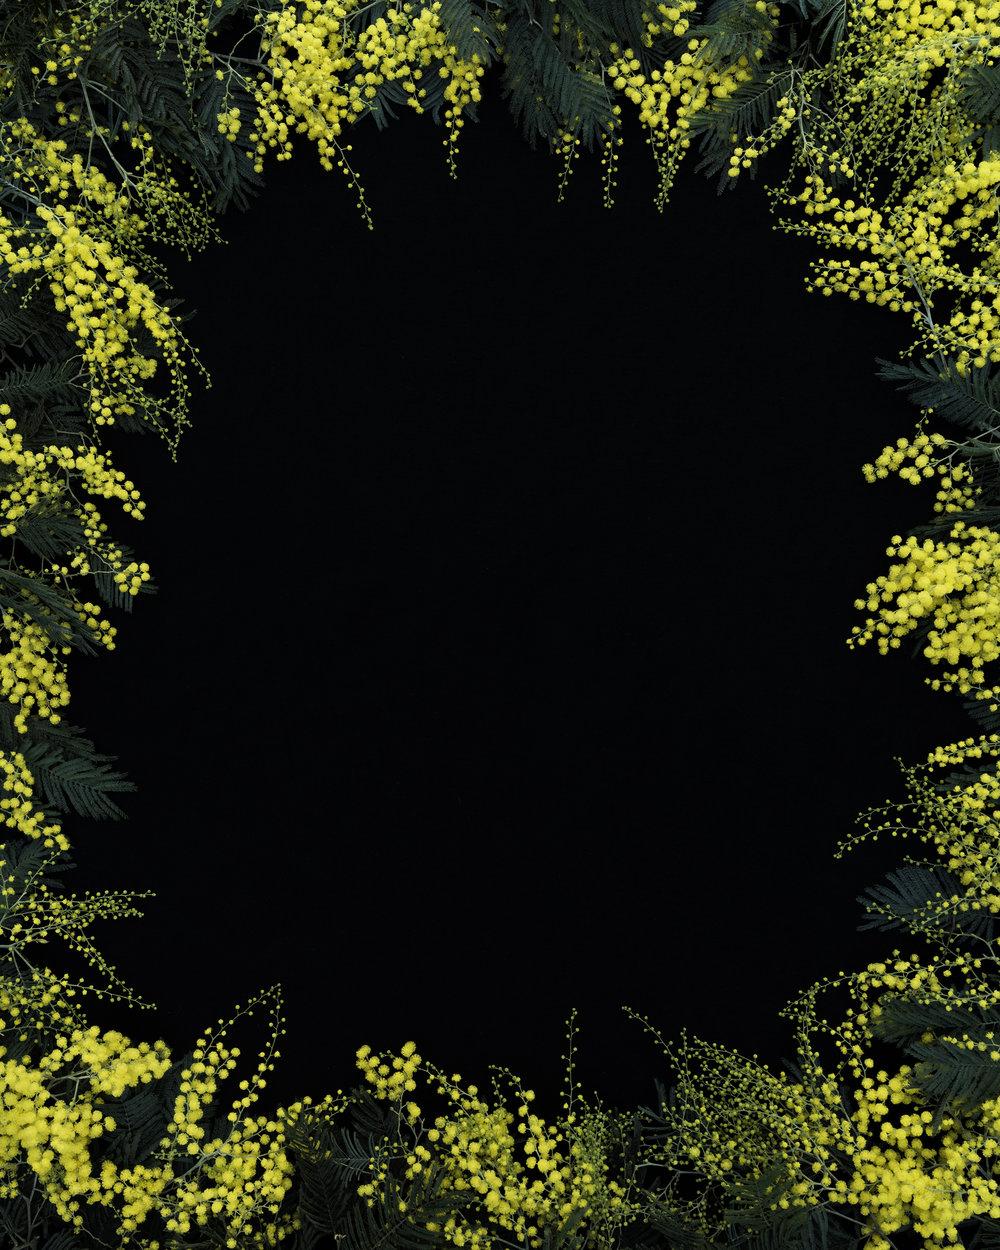 J, John Priola,  Acacia Flowers , 2018